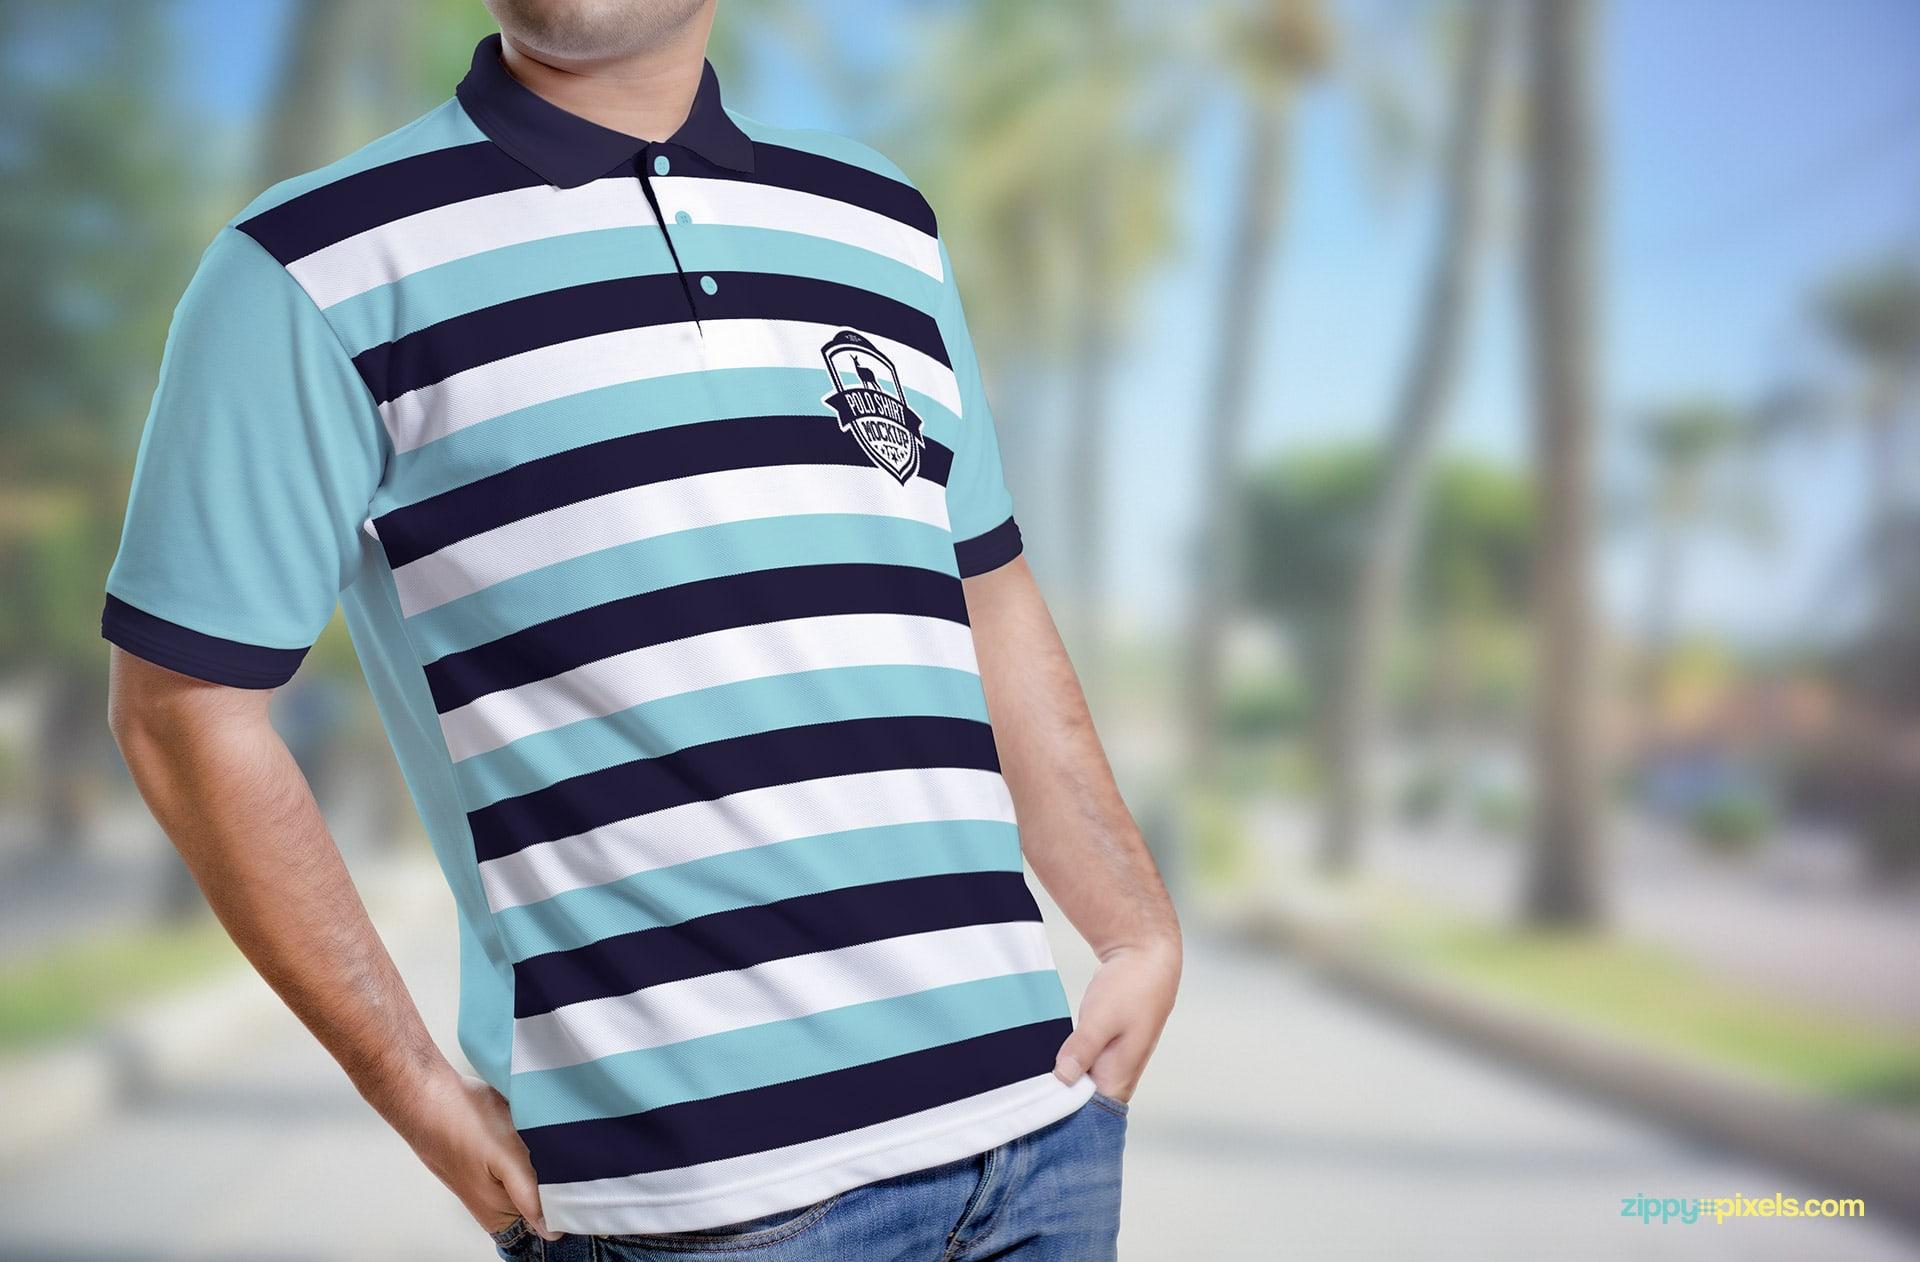 Realistically portrait your shirt designs